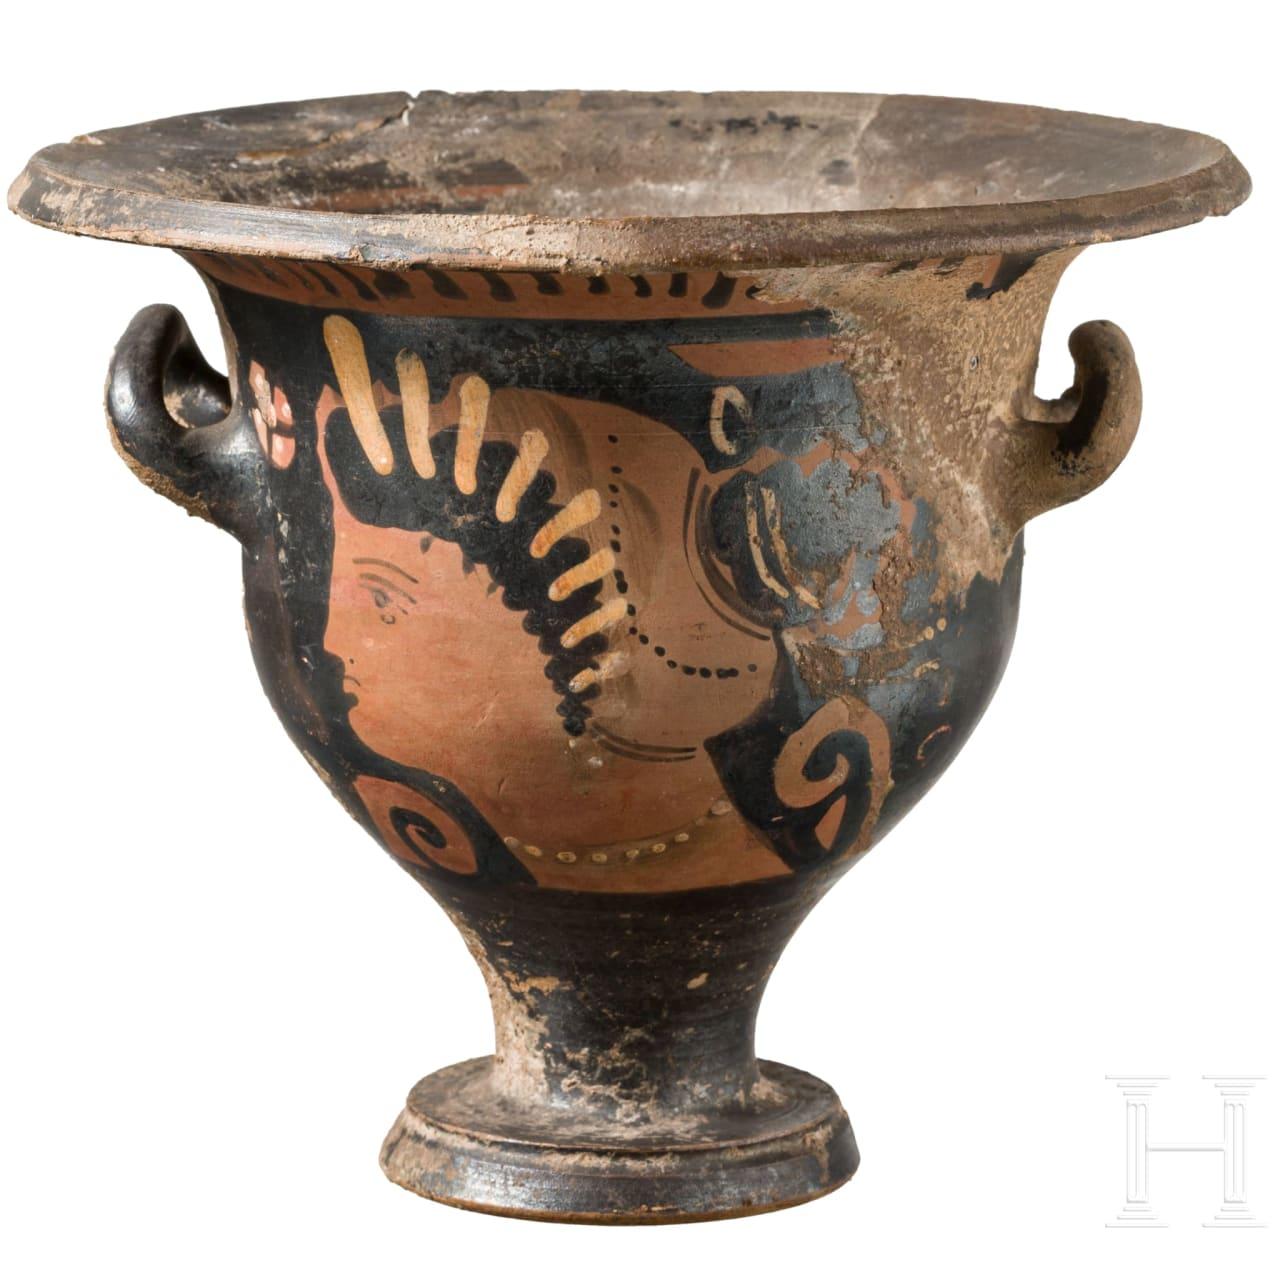 Kleiner Glockenkrater, Magna Graecia, Unteritalien, 4. Jhdt. v. Chr.